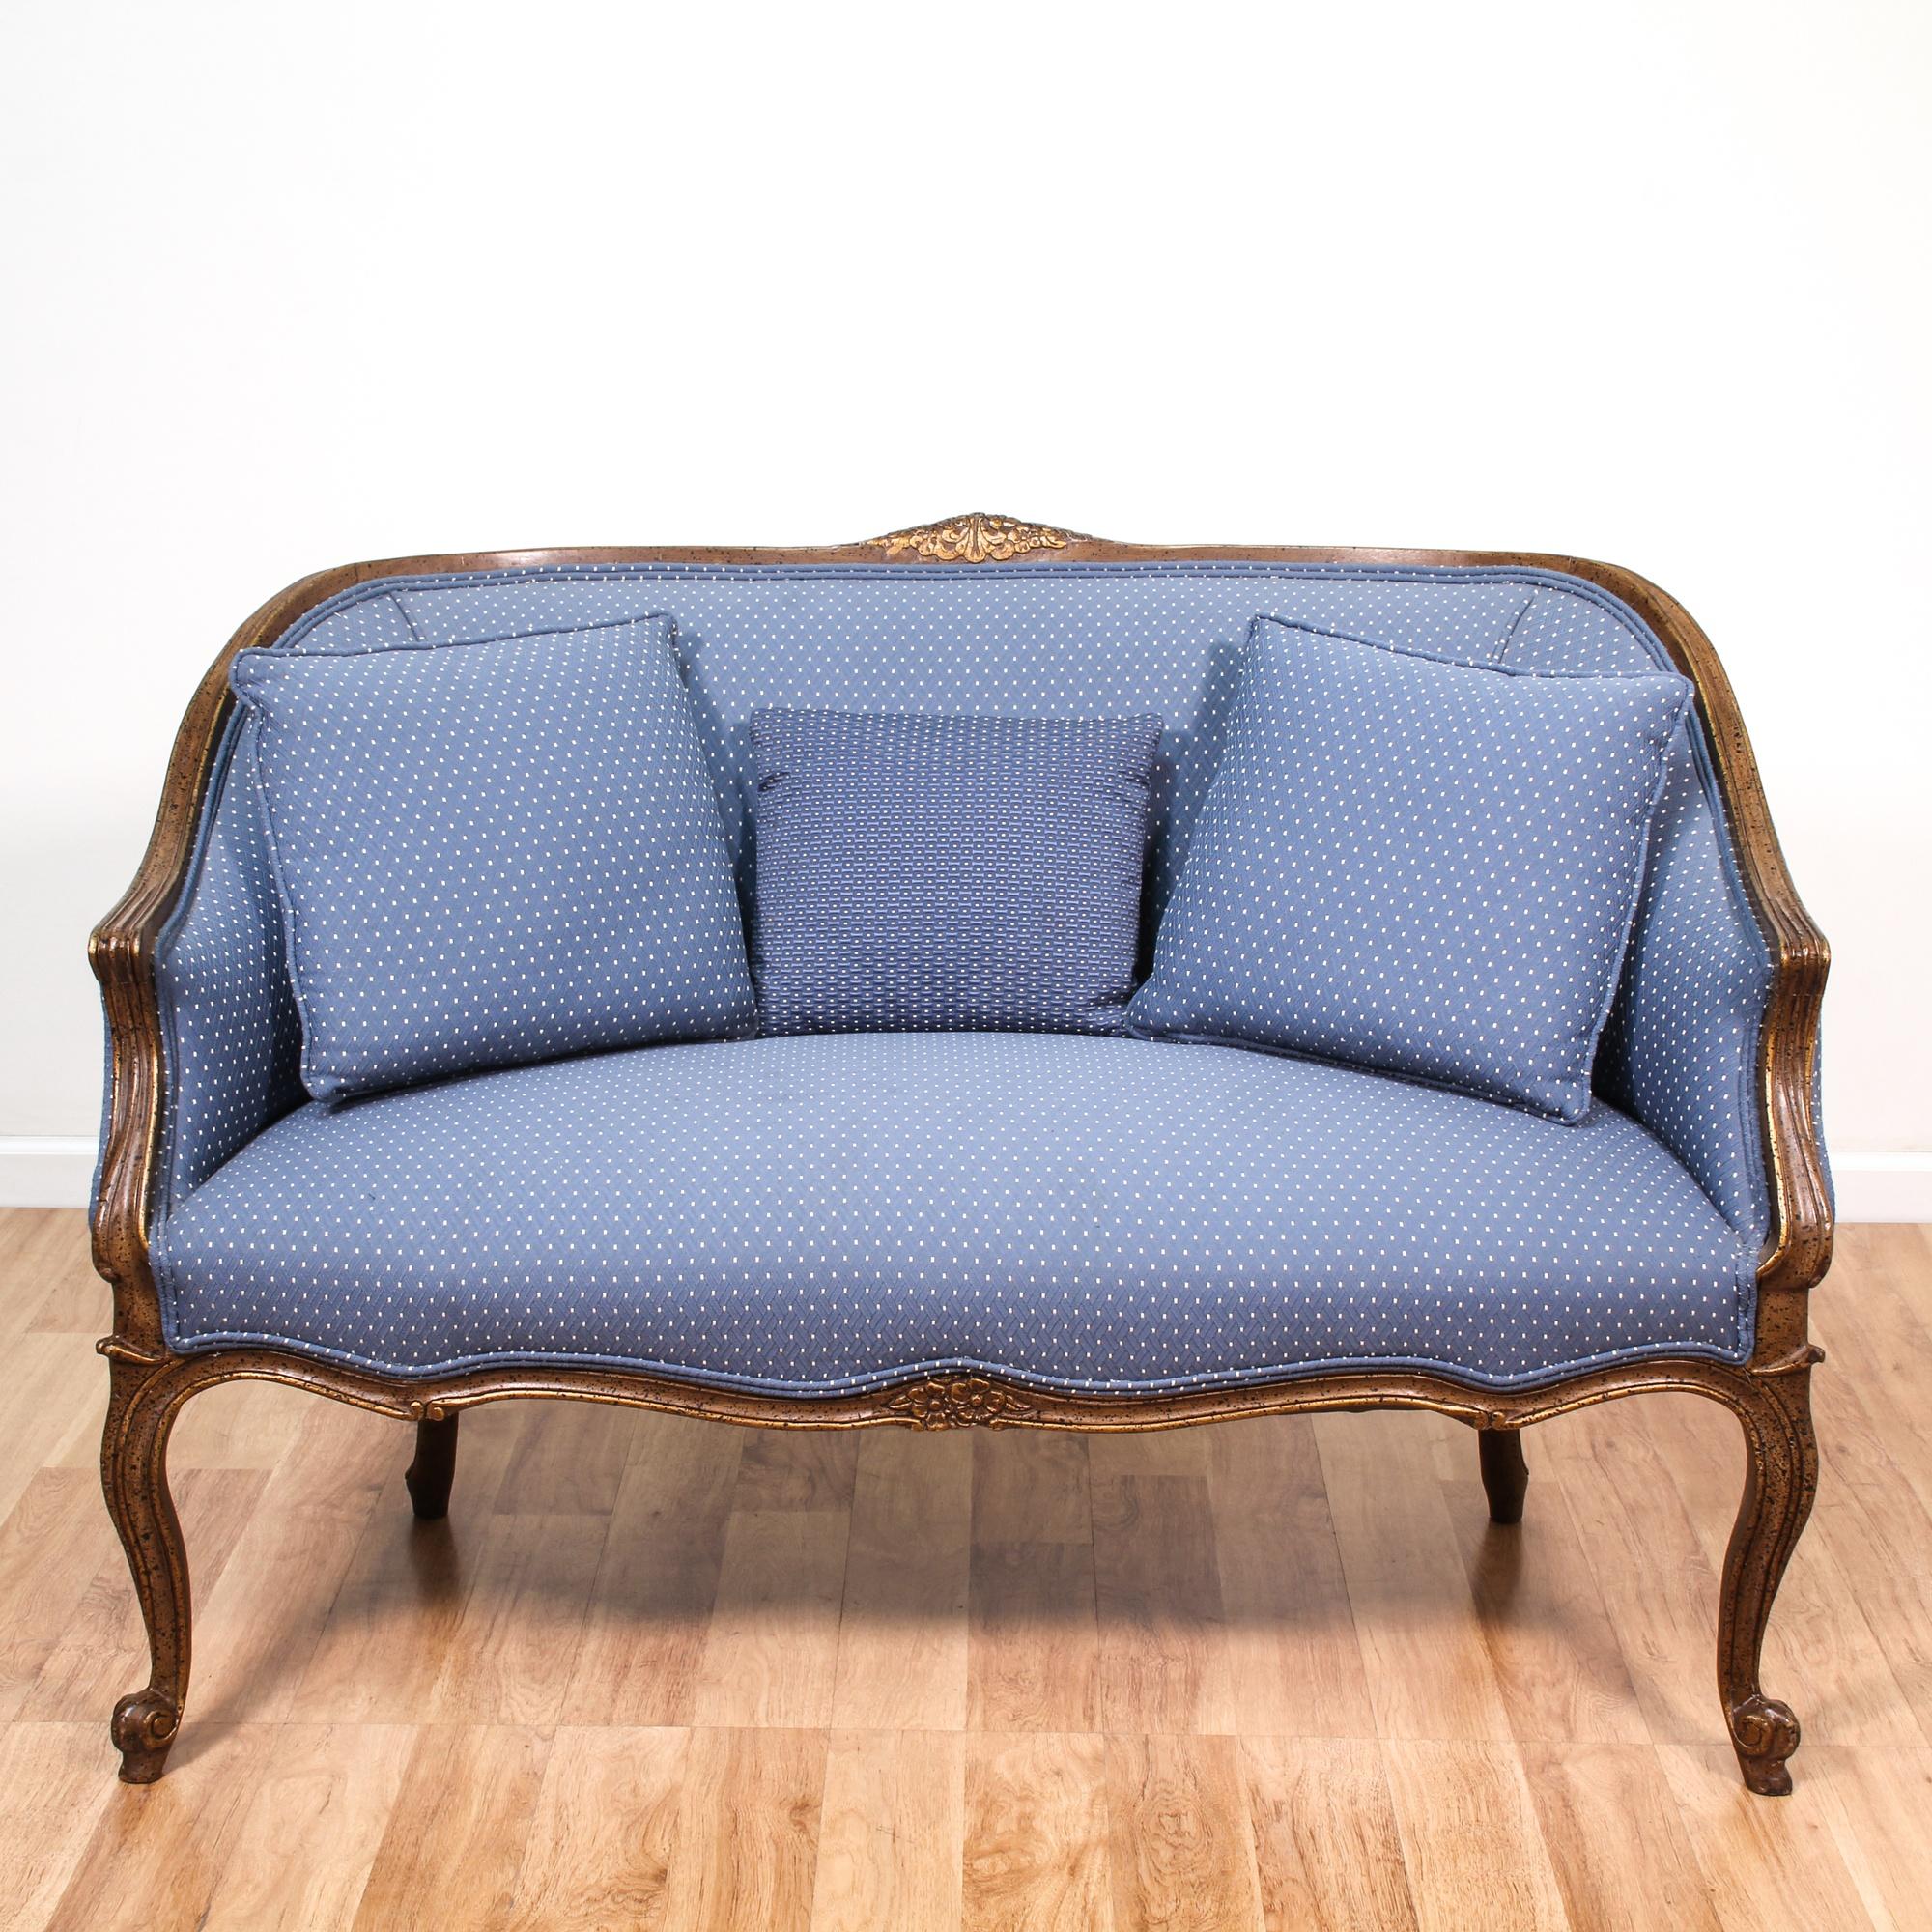 century studio miranda modern loveseat light petite grey baxton mid upholstered fabric